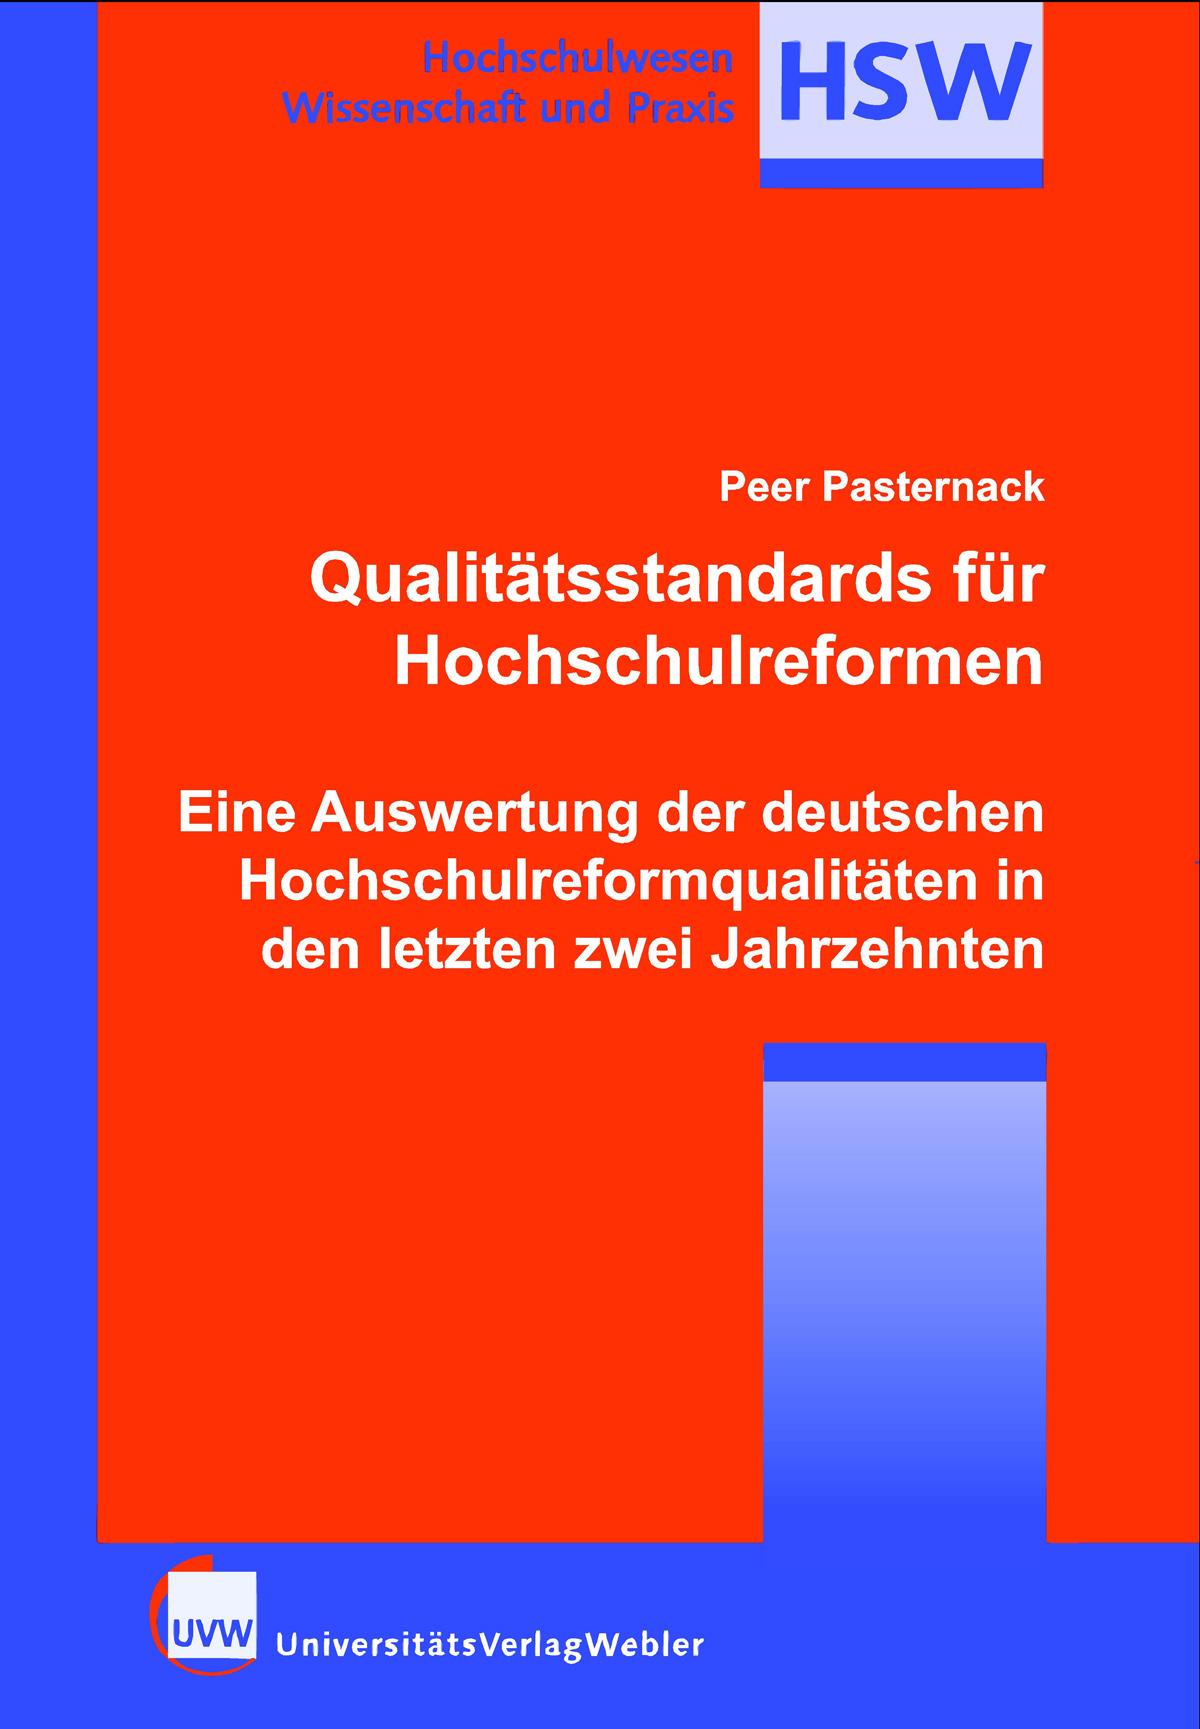 pasternack_qualitaetsstandards